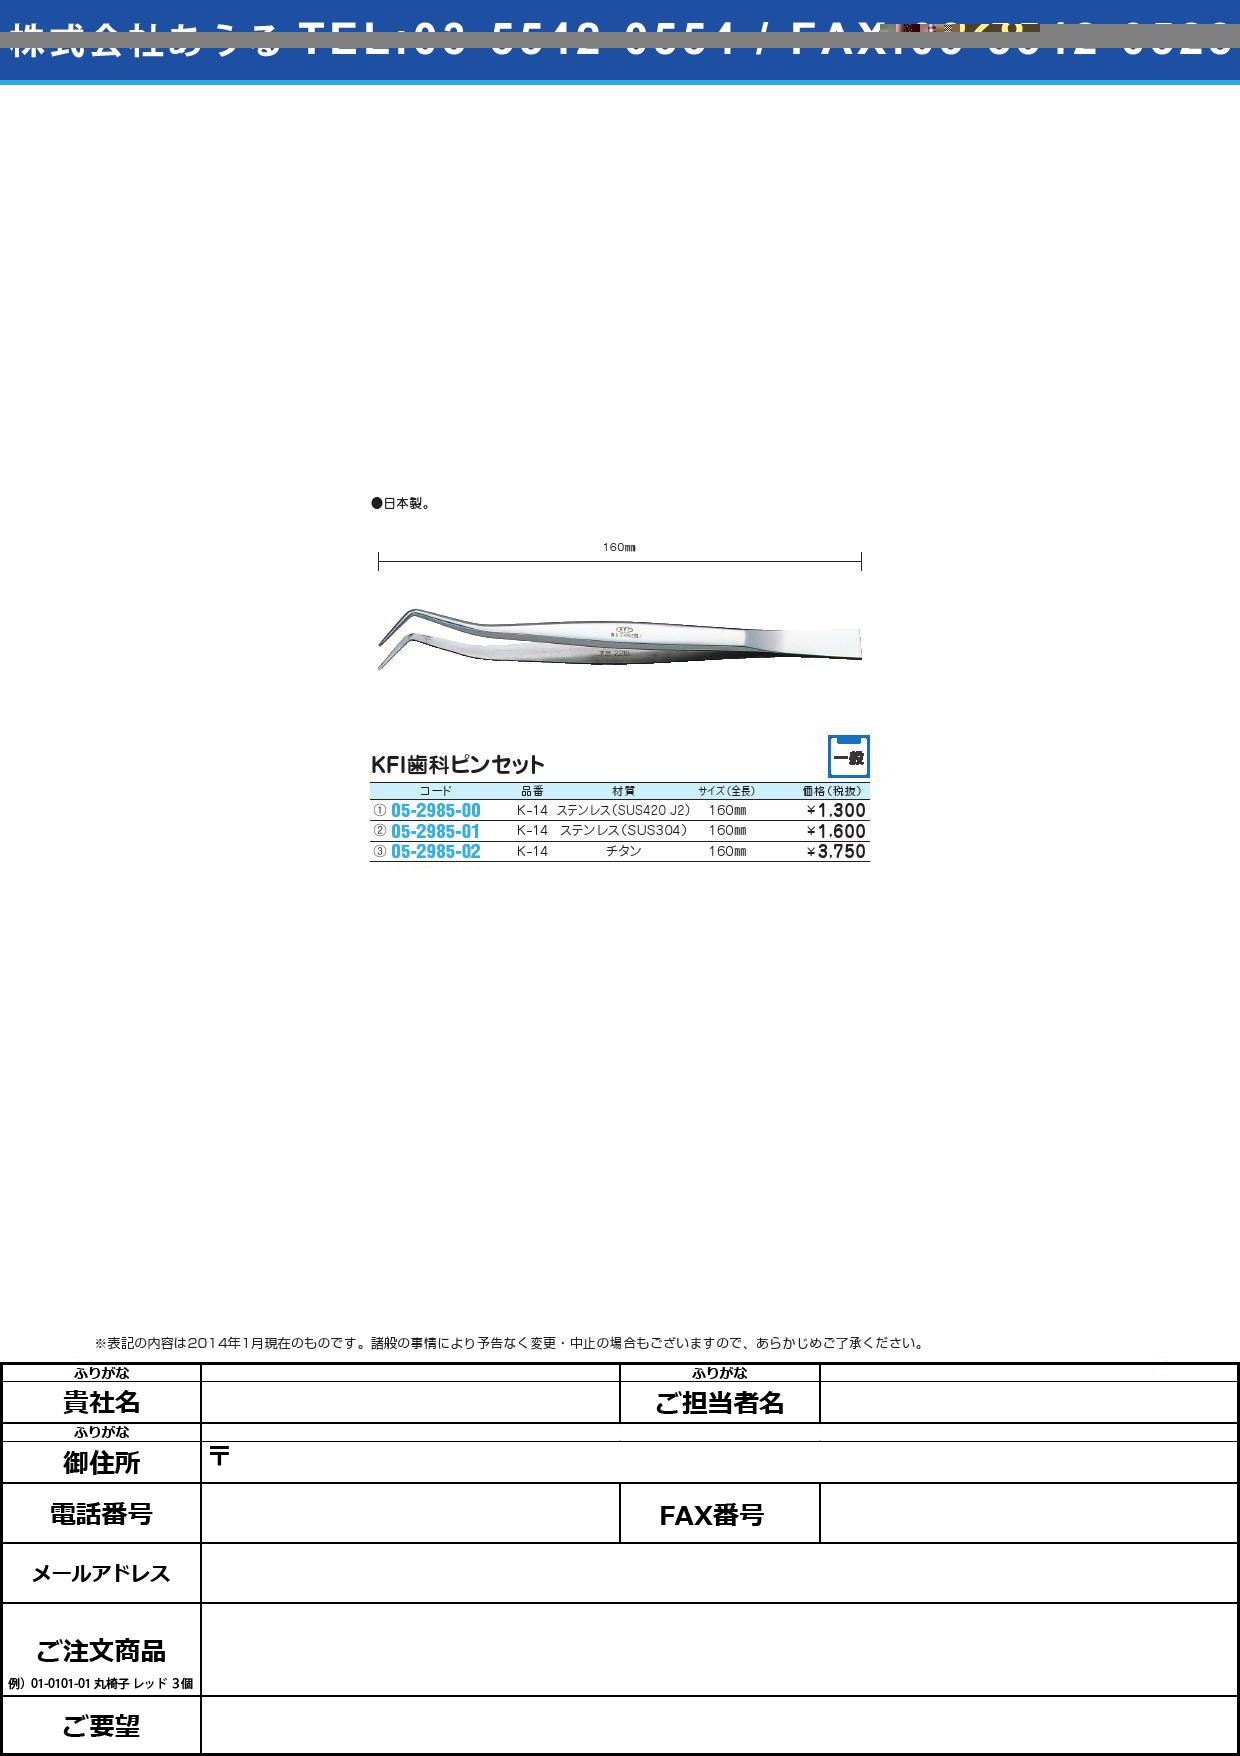 KFI歯科ピンセット ピンセット(05-2985-02)K-14 (チタン) 160MM【1本単位】【2014年カタログ商品】